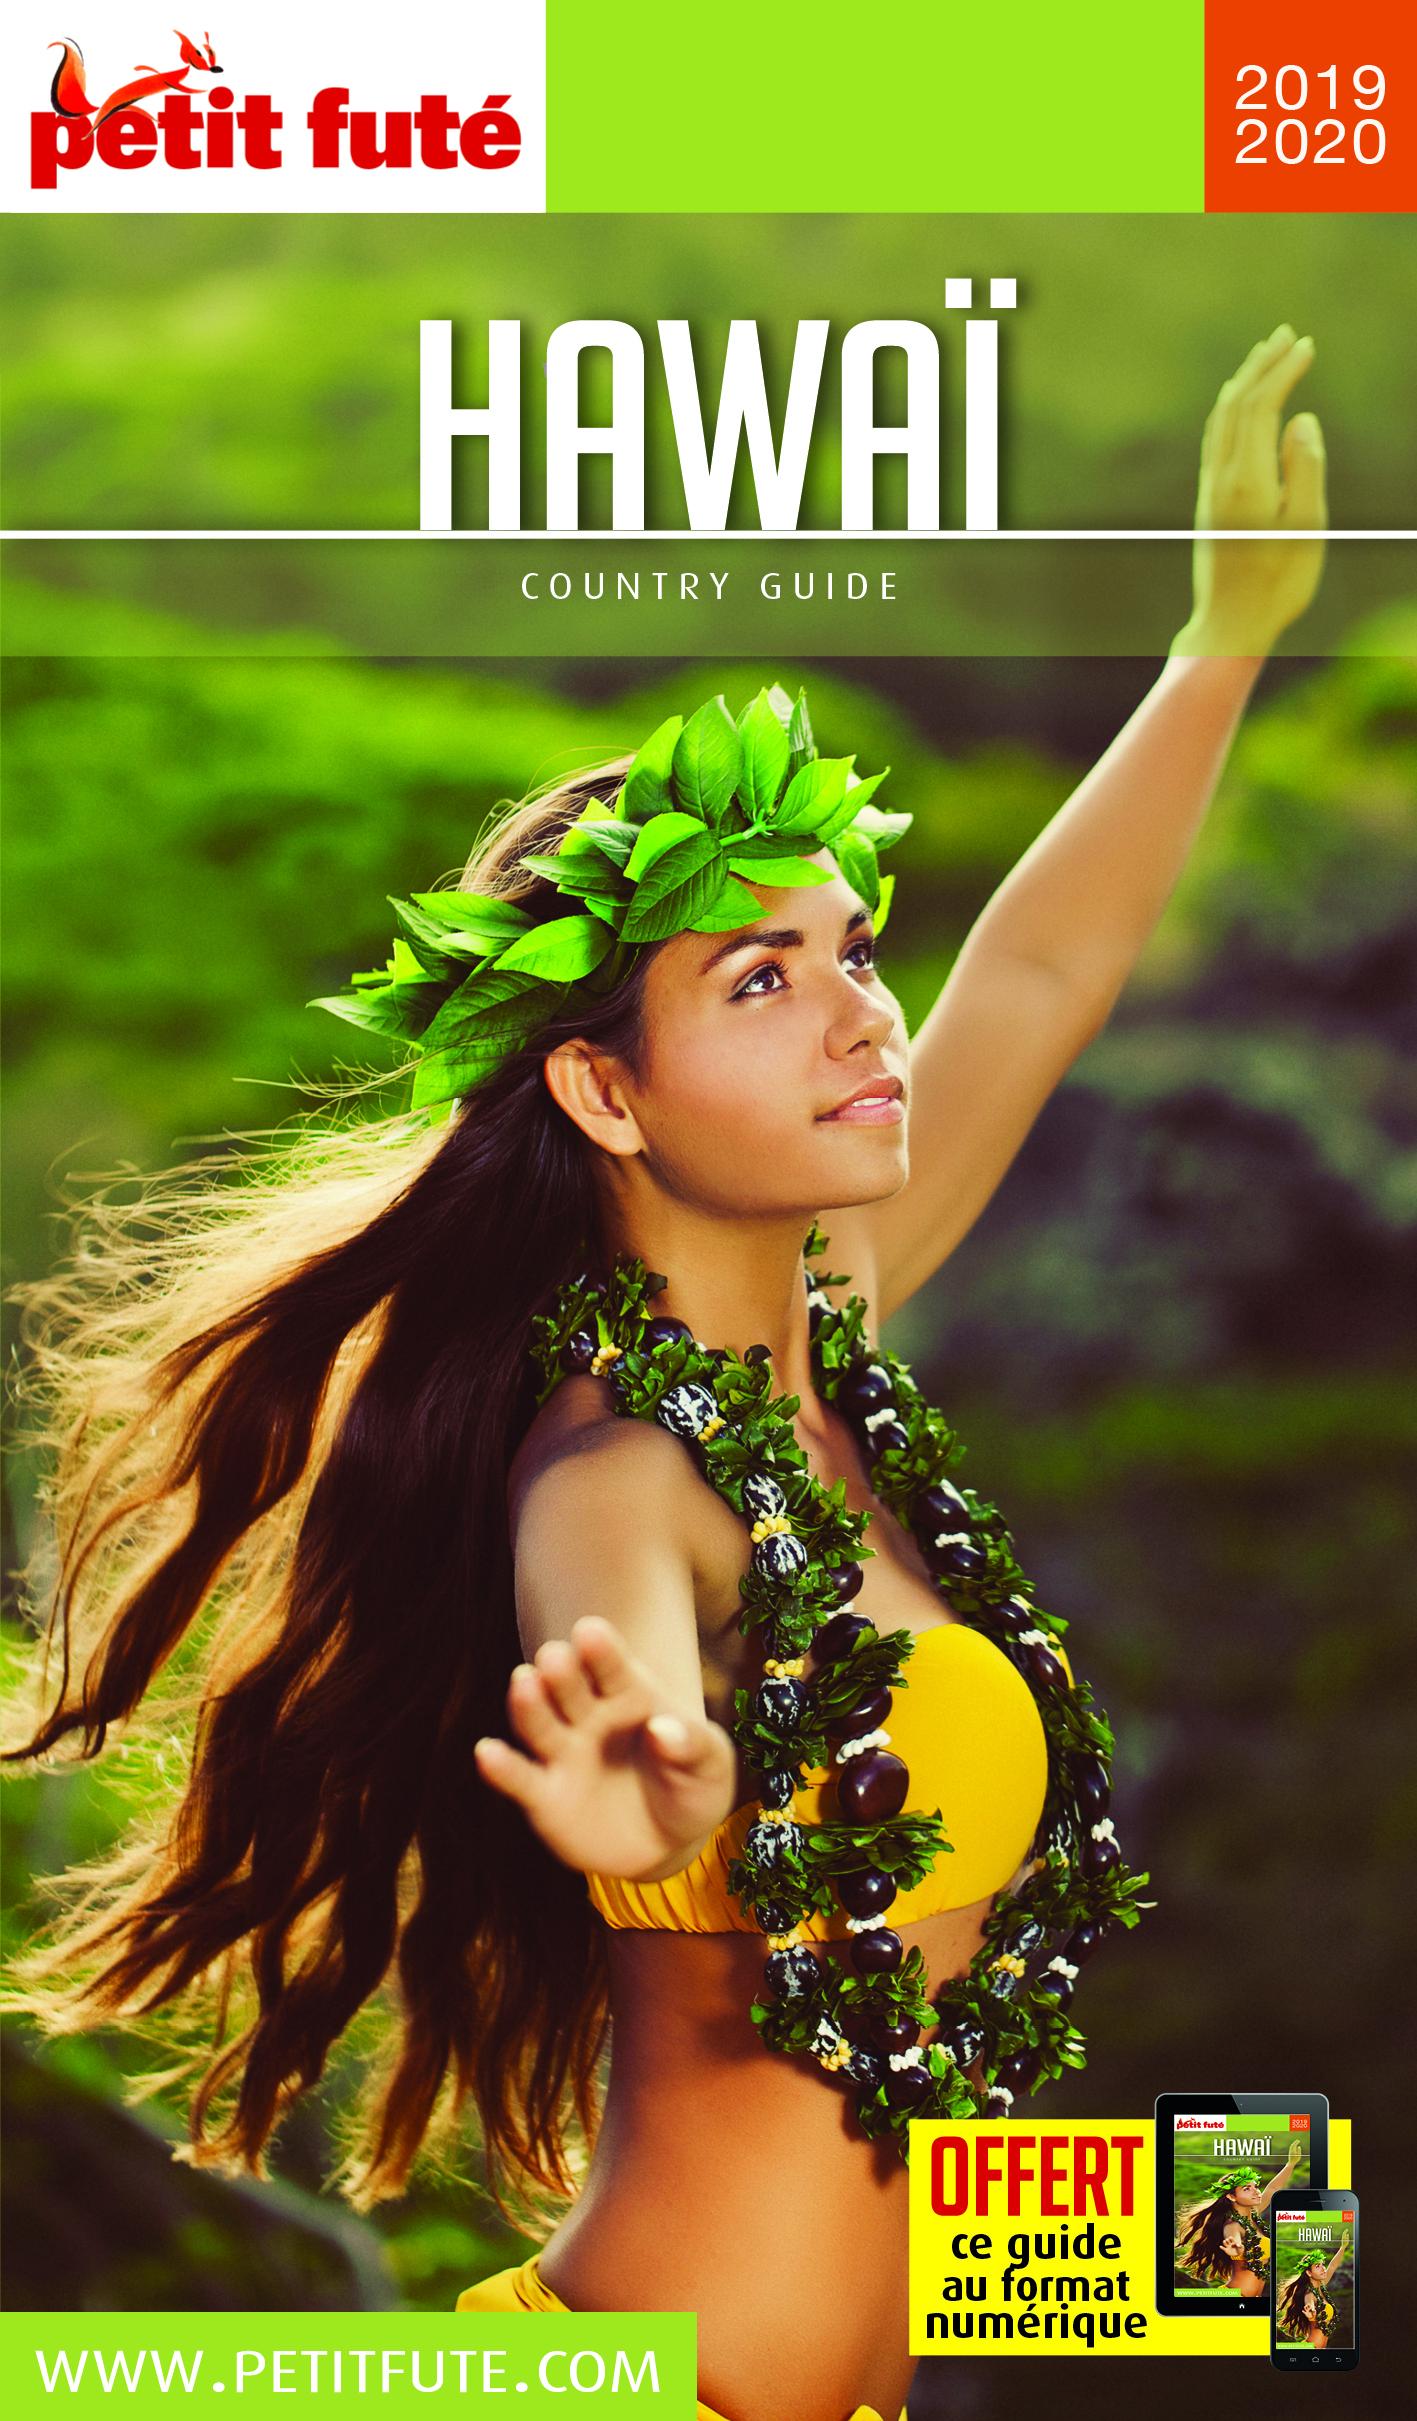 HAWAI 2019 PETIT FUTE+OFFRE NUM